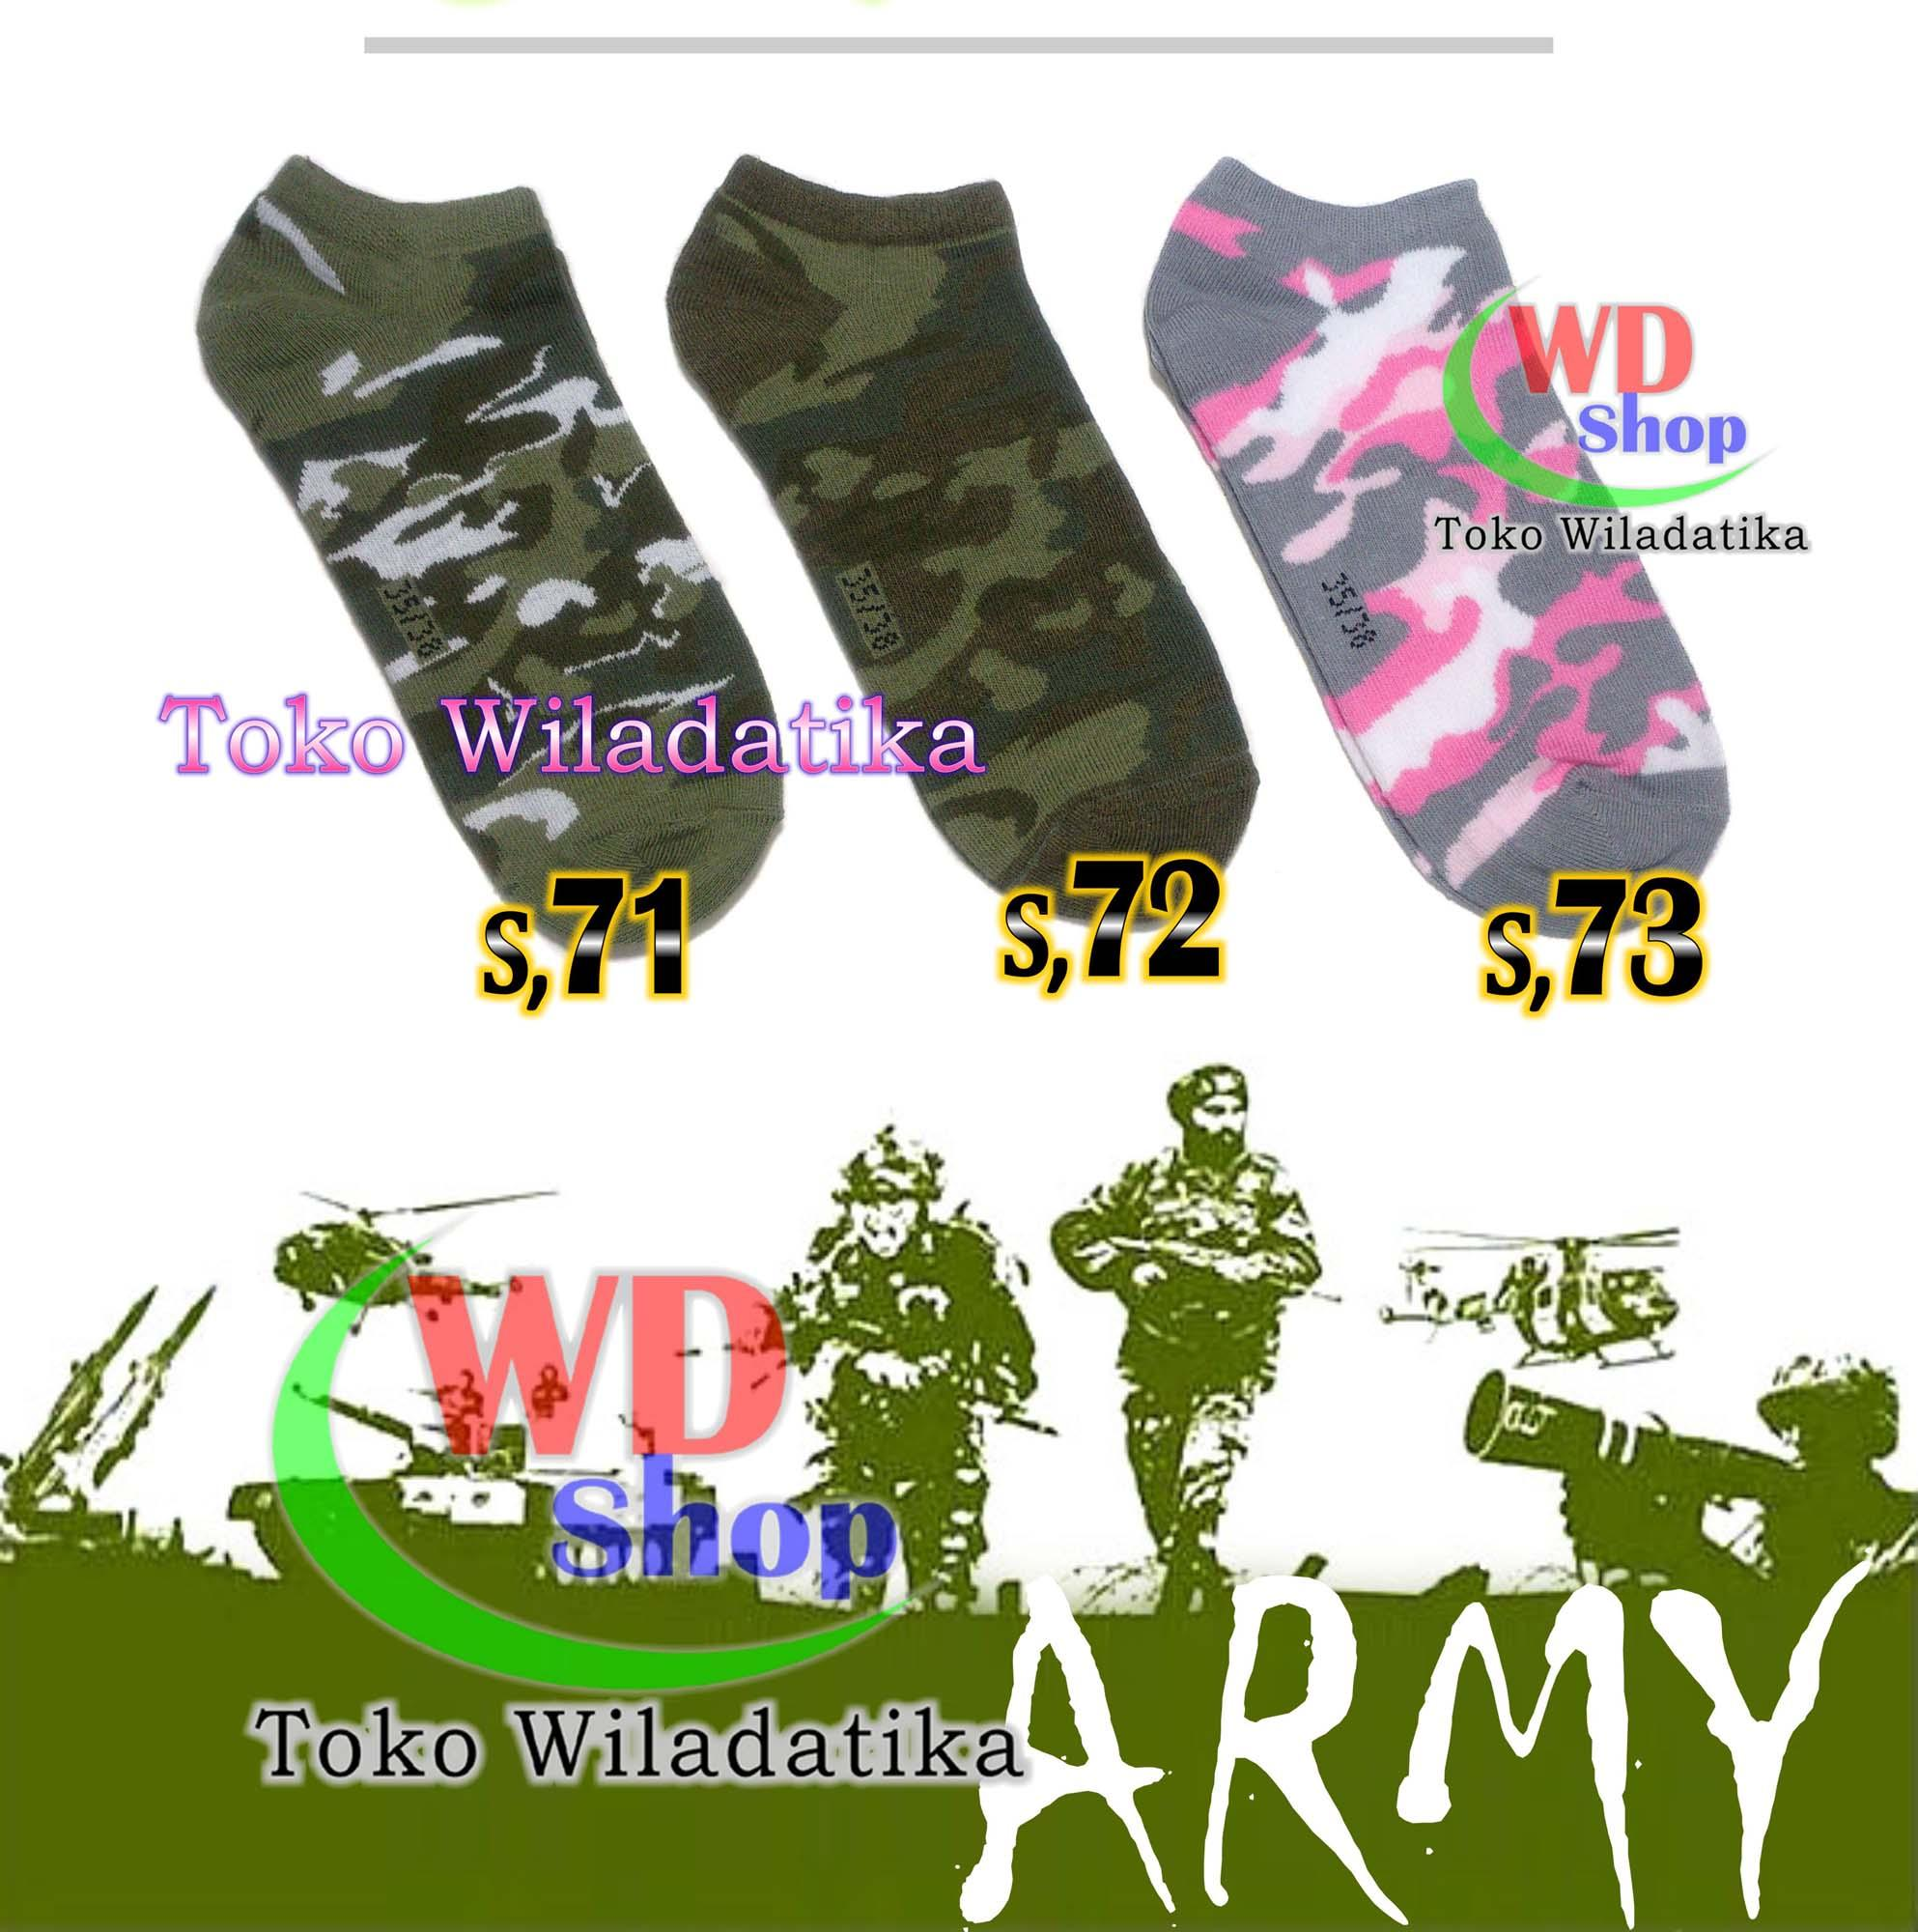 Kelebihan Baju Kaos Raglan Reglan Army Doreng Camo Tentara Loreng Tni Cowok Gym Fitness Kaus Kaki Sport Olahraga Tenis Dan